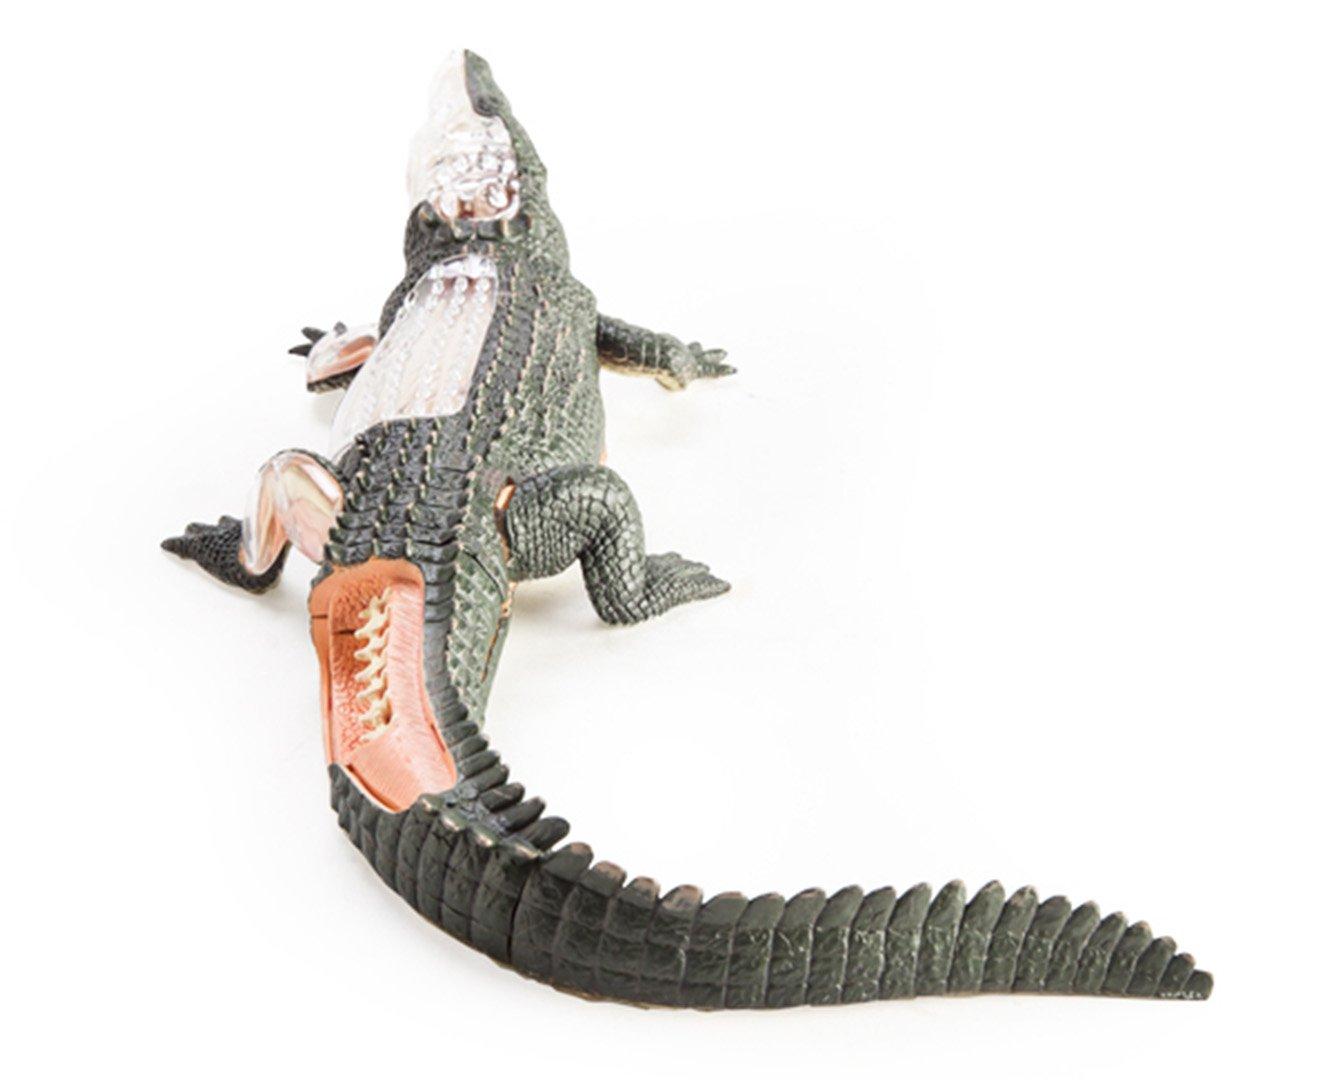 Amazon.com: 4D Anatomy Crocodile: Toys & Games